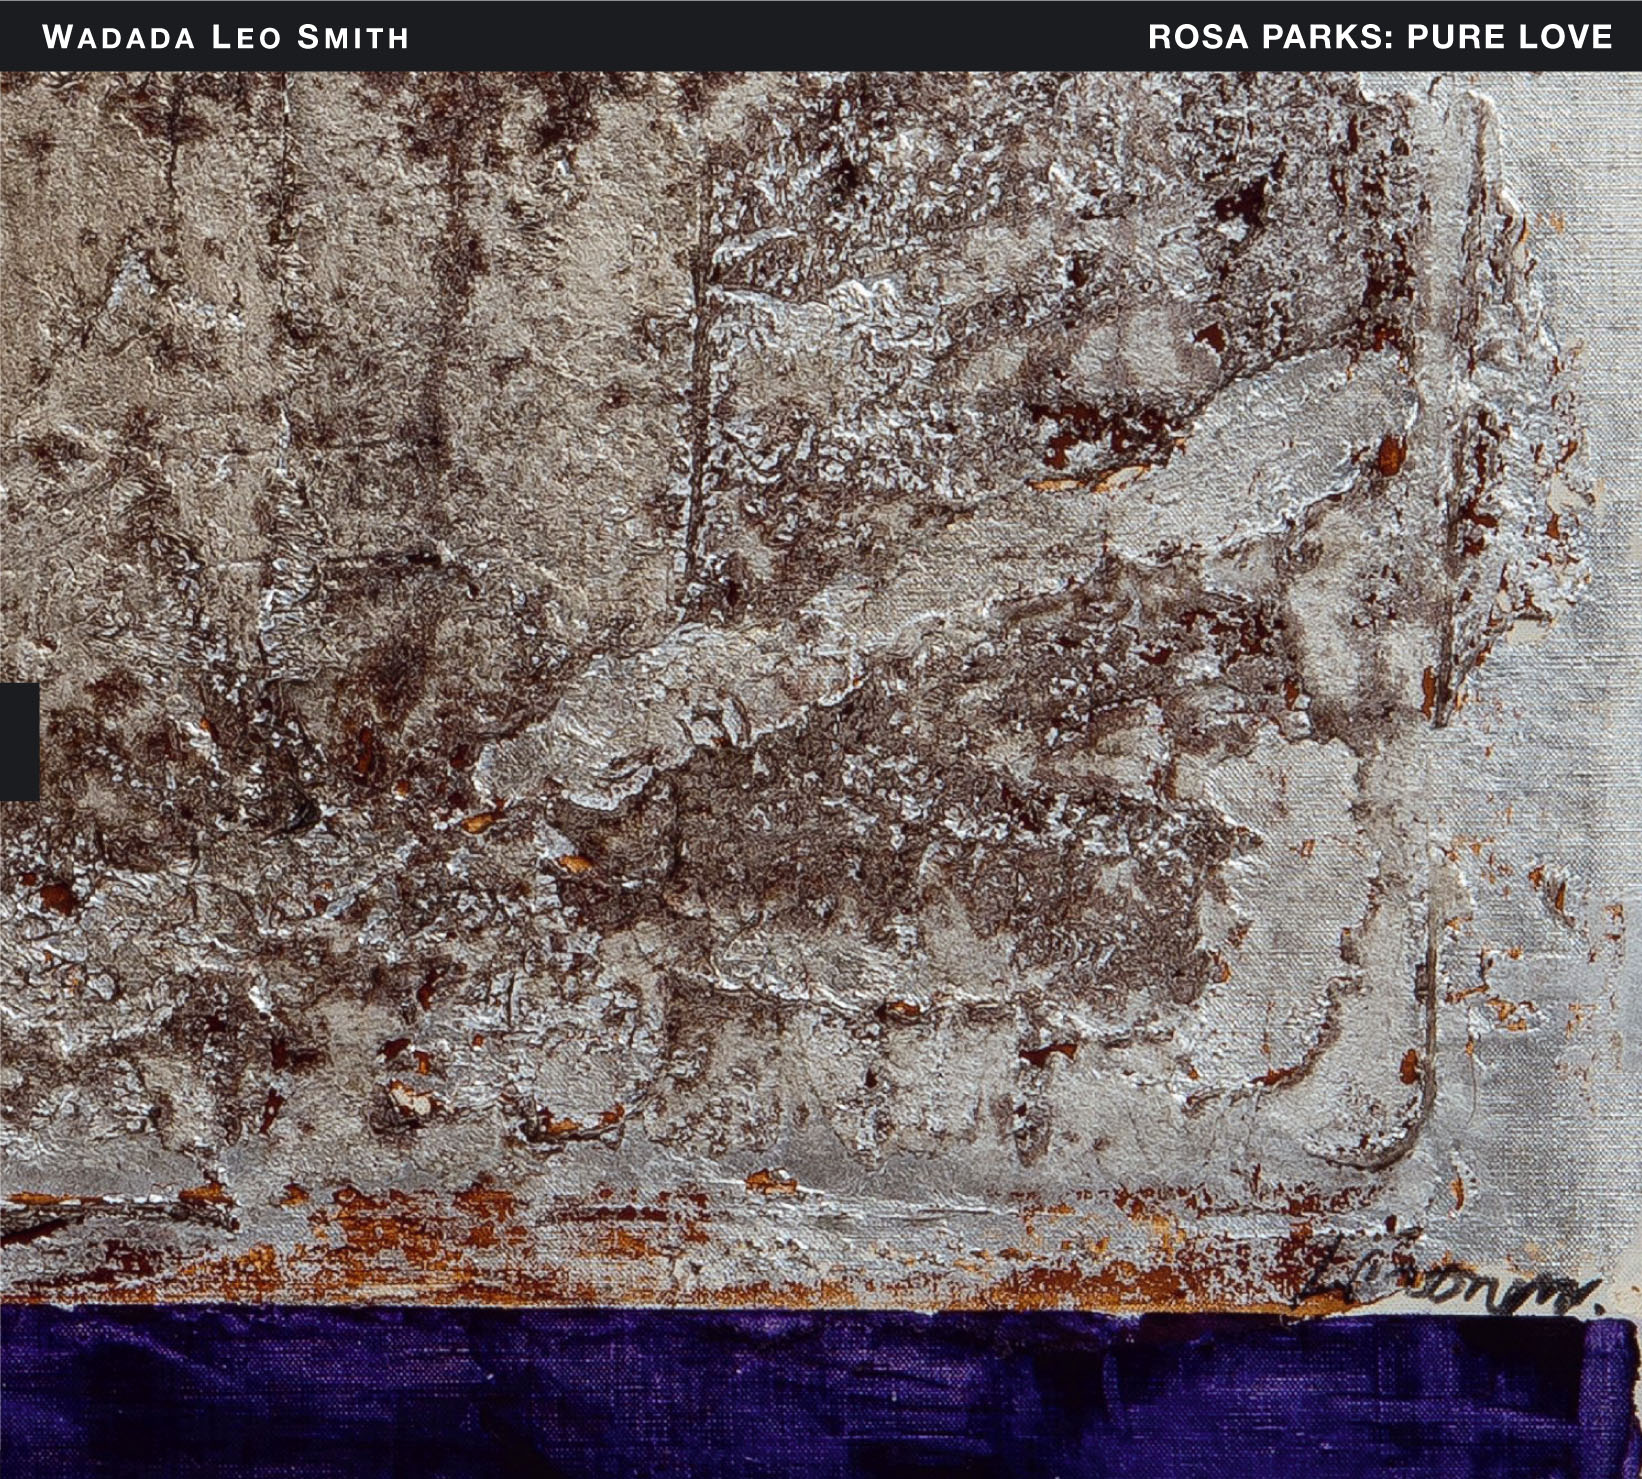 Wadada Leo Smith<br/>Rosa Parks: Pure Love. An Oratorio of Seven Songs<br/>TUM, 2019